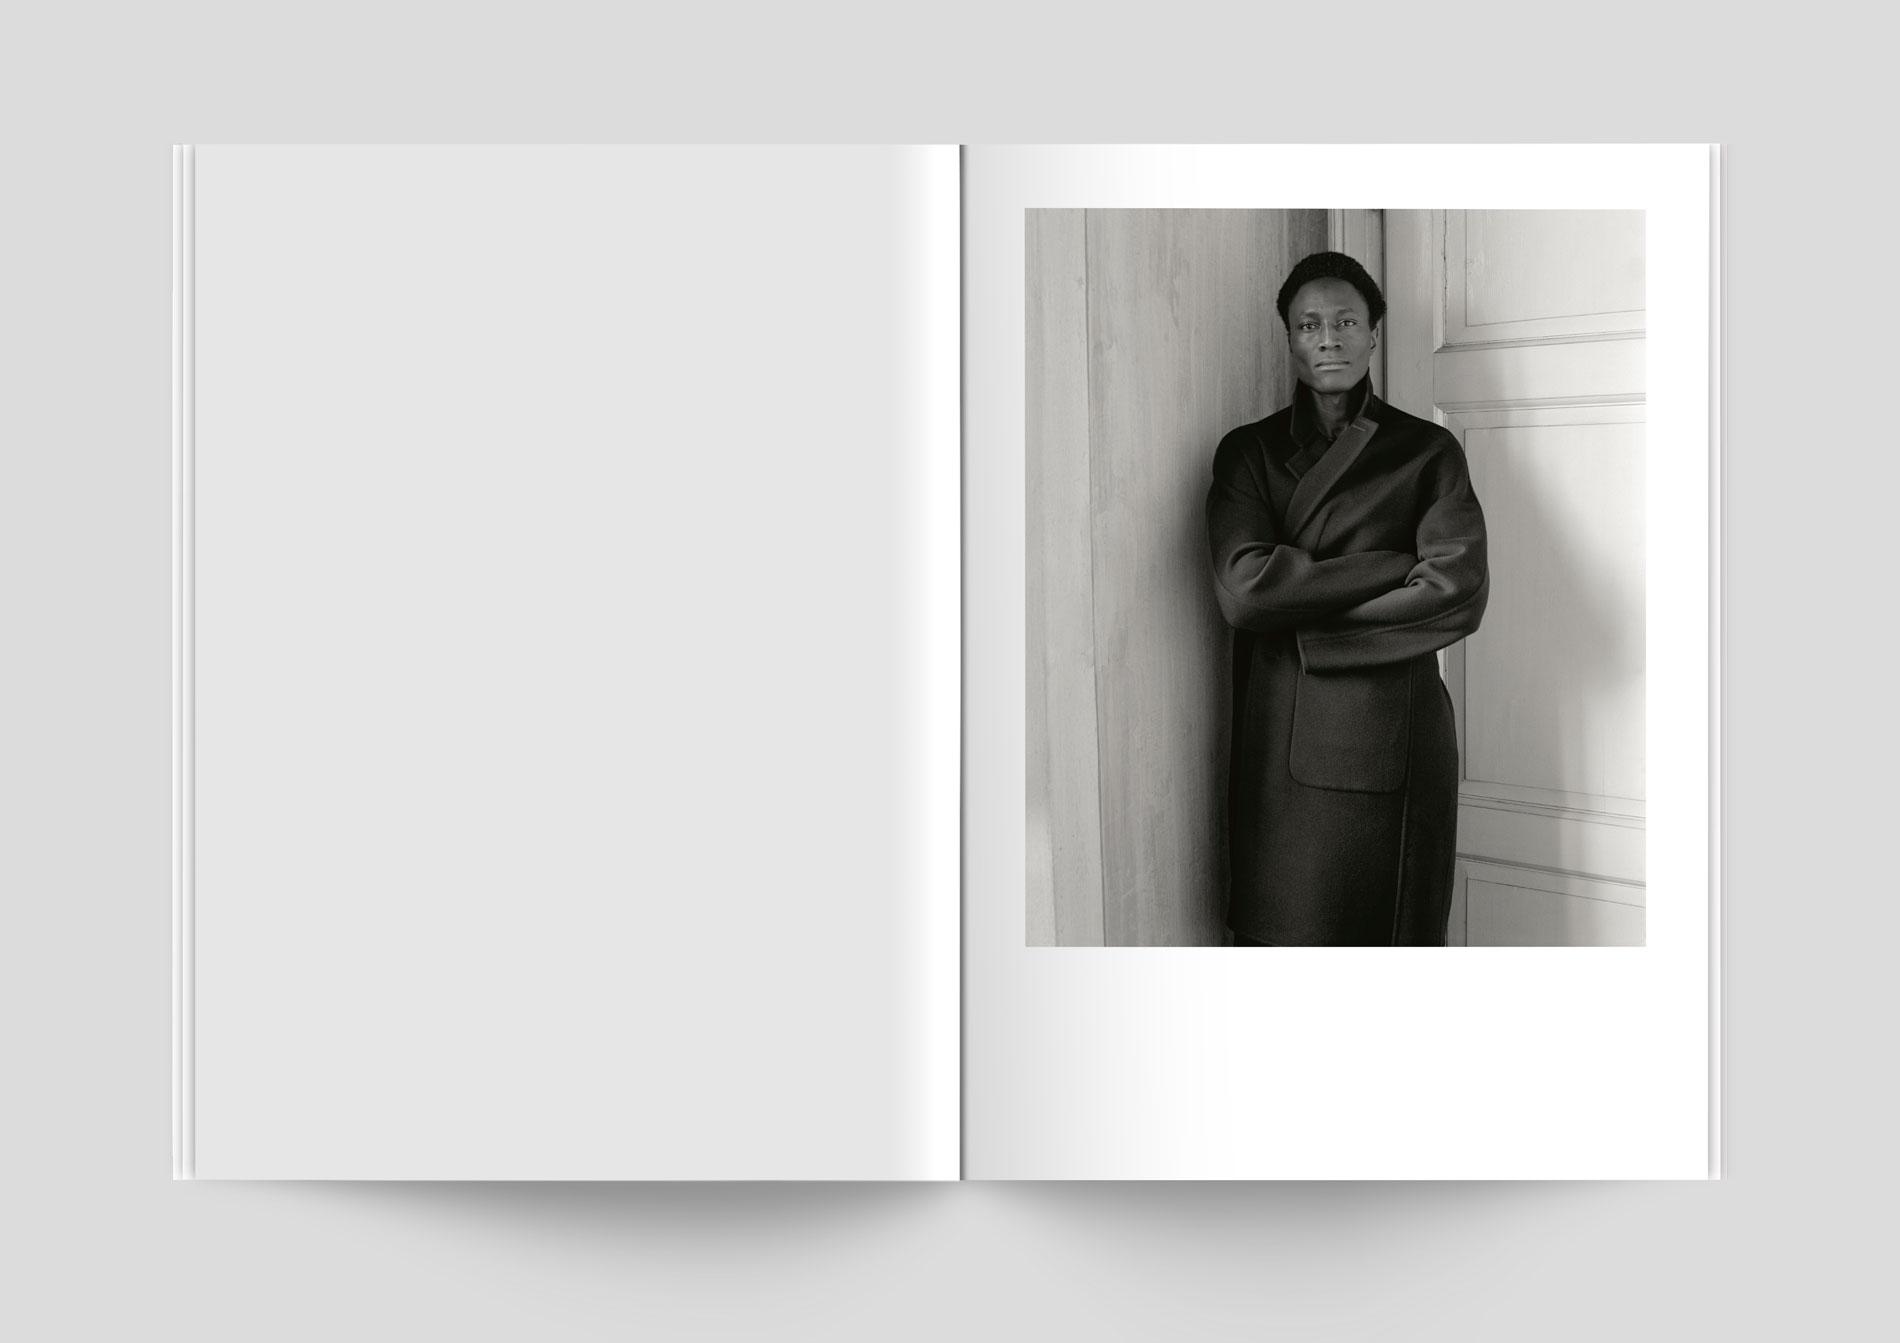 Santoni-Edited-by-Marco-Zanini-Ingar-Krauss-00